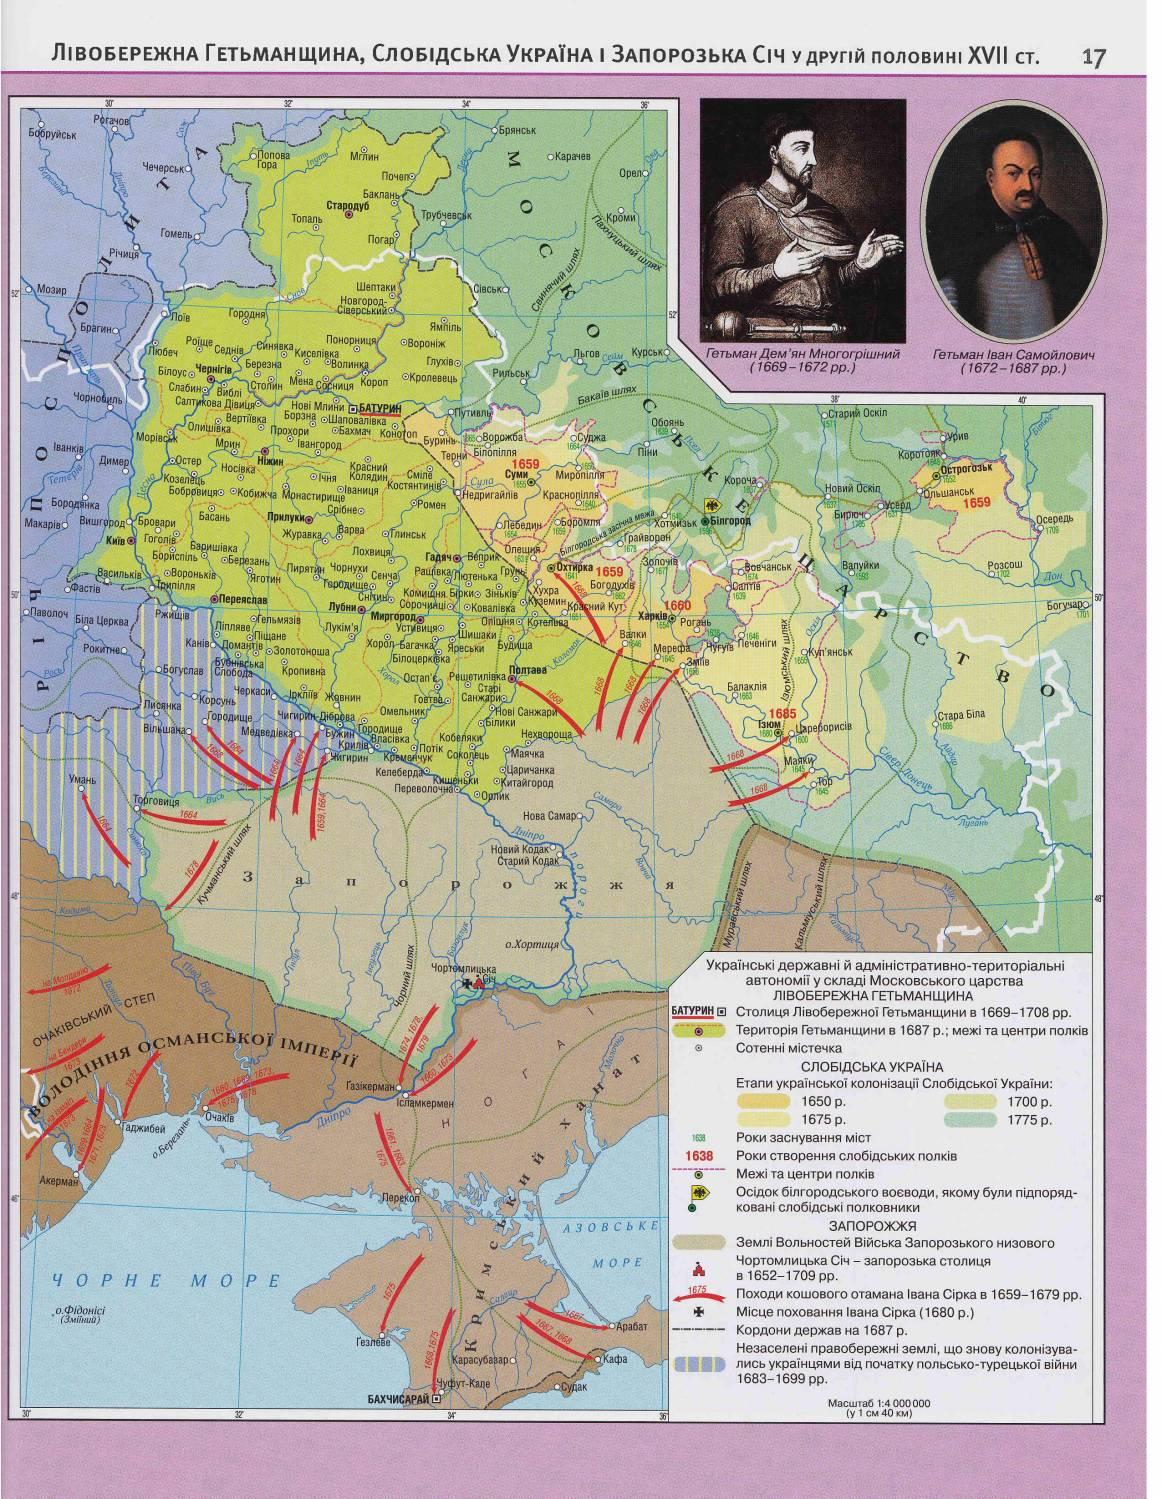 Ленинградская господарство лівобережної україни за часів гетьманщини что данный